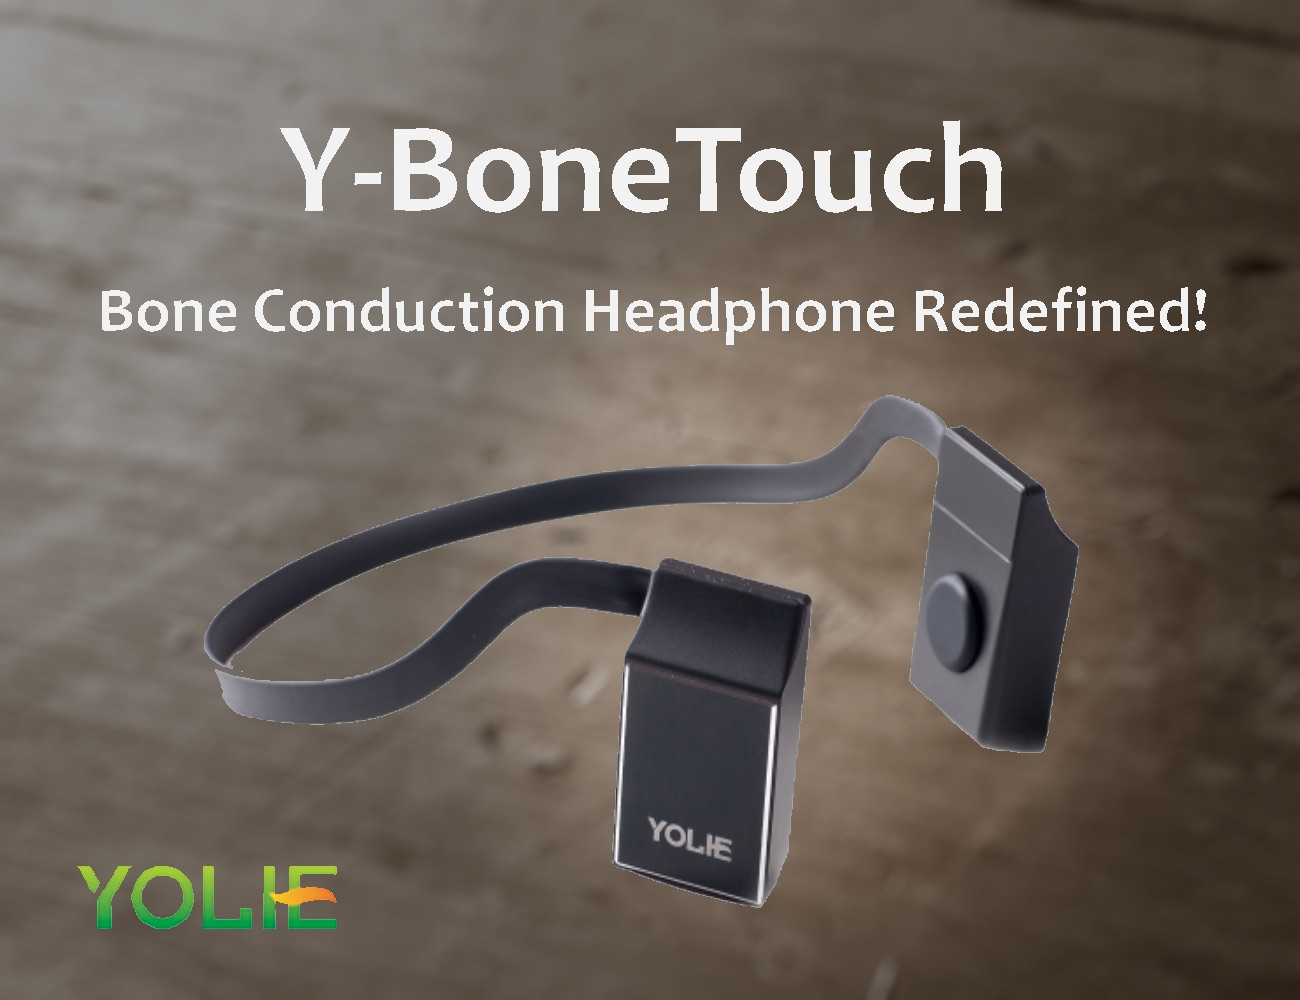 Bone Conduction Headphone – Redefined